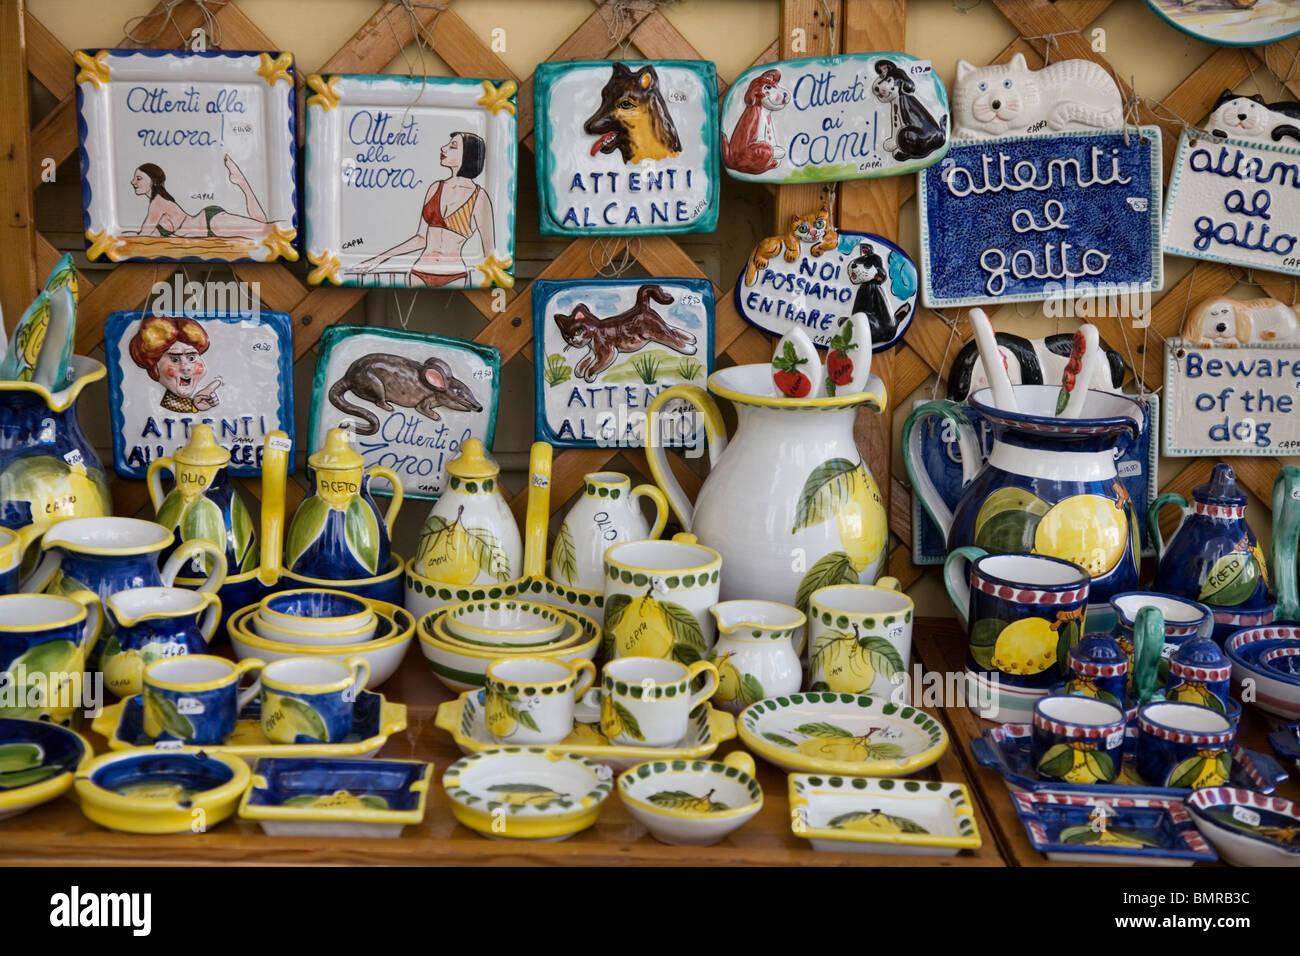 Souvenirs And Pottery Capri Italy Stock Photo 30017104